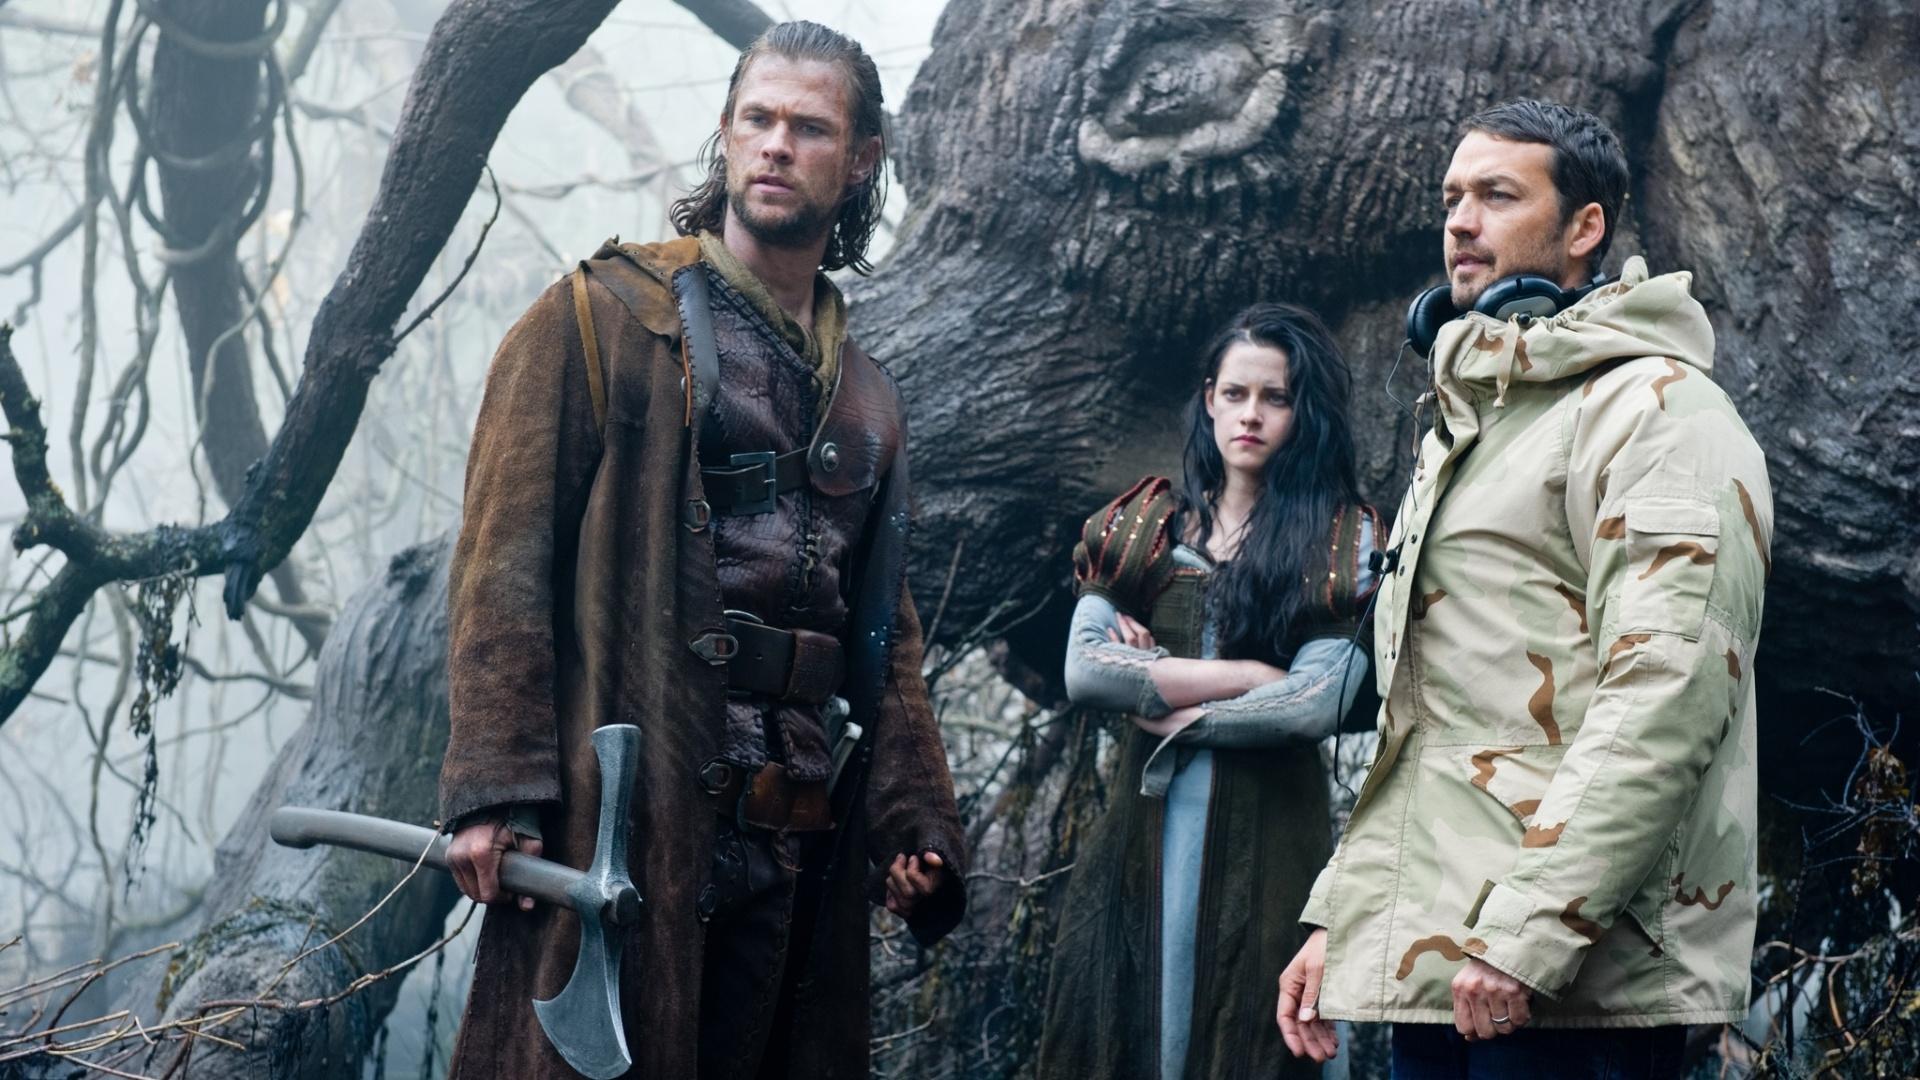 Chris Hemsworth, Kristen Stewart e o diretor Rupert Sanders durante as filmagens de